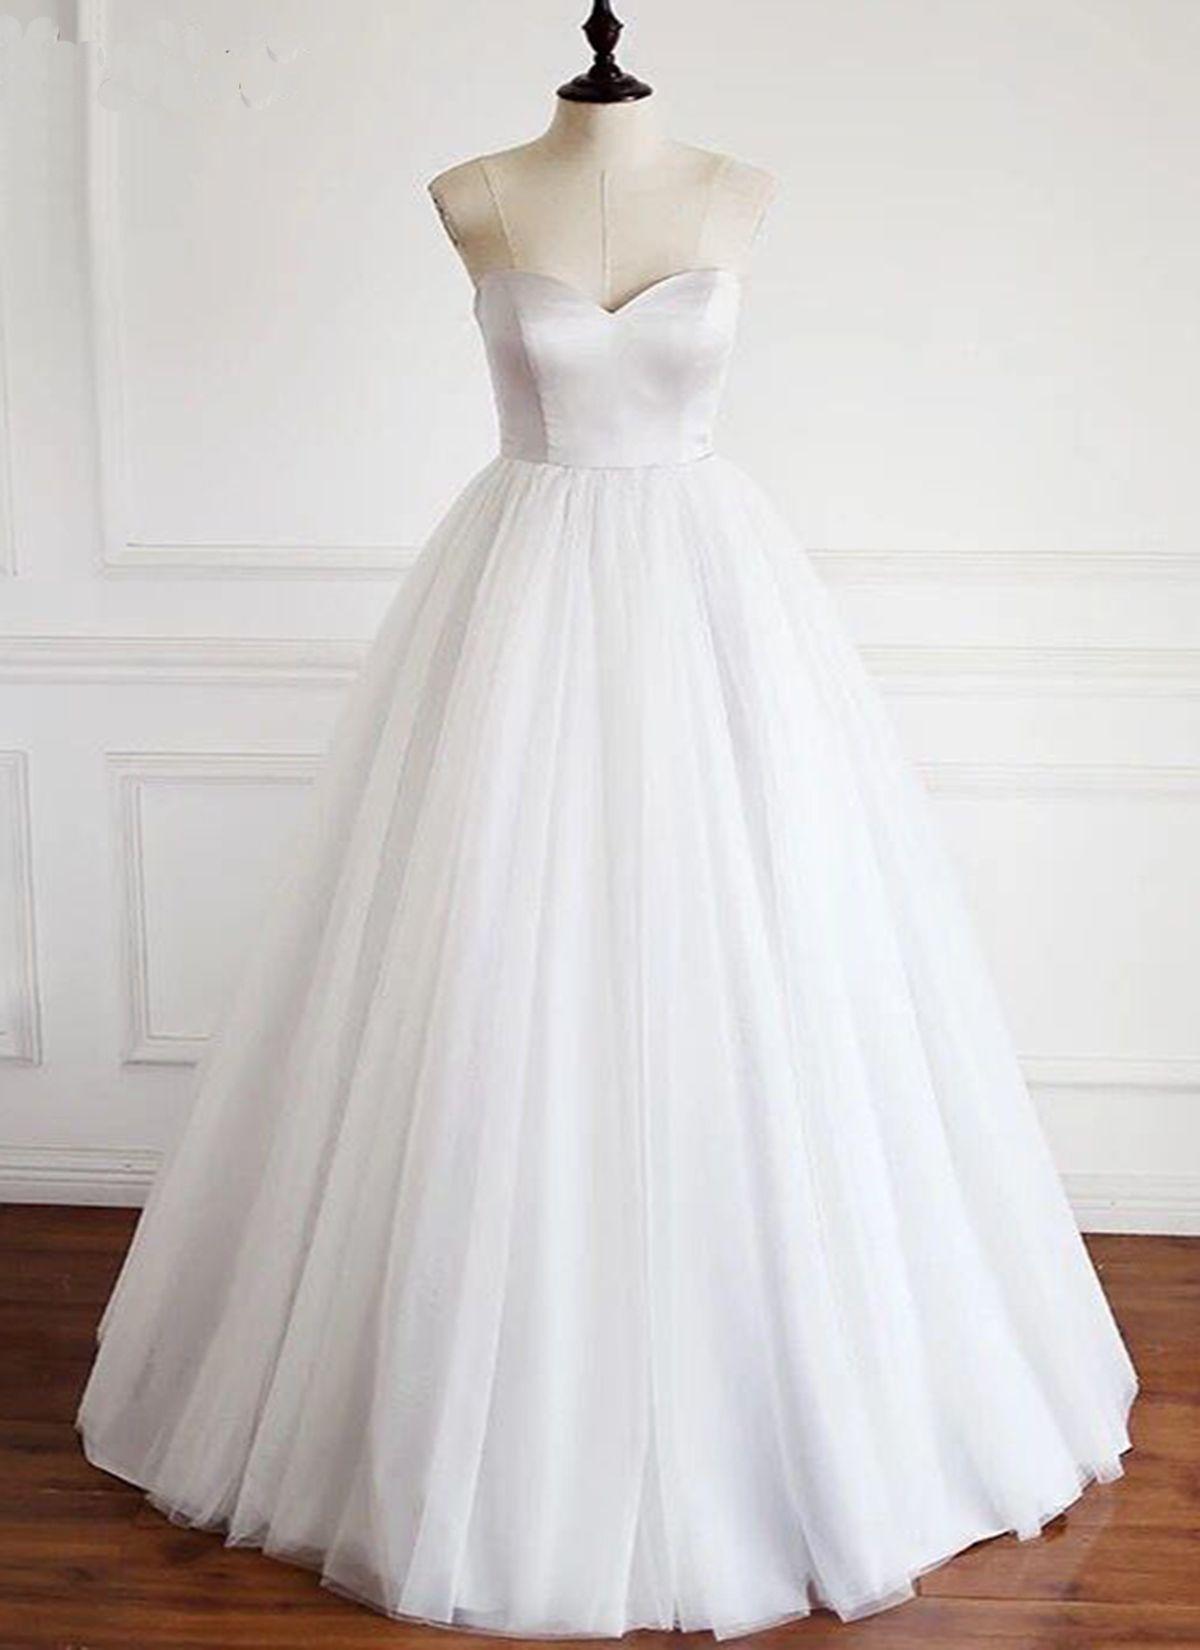 c7b374363ca99 Simple White Tulle Sweetheart Neckline Wedding Dress, Formal Dress  #promdress #prom #dress